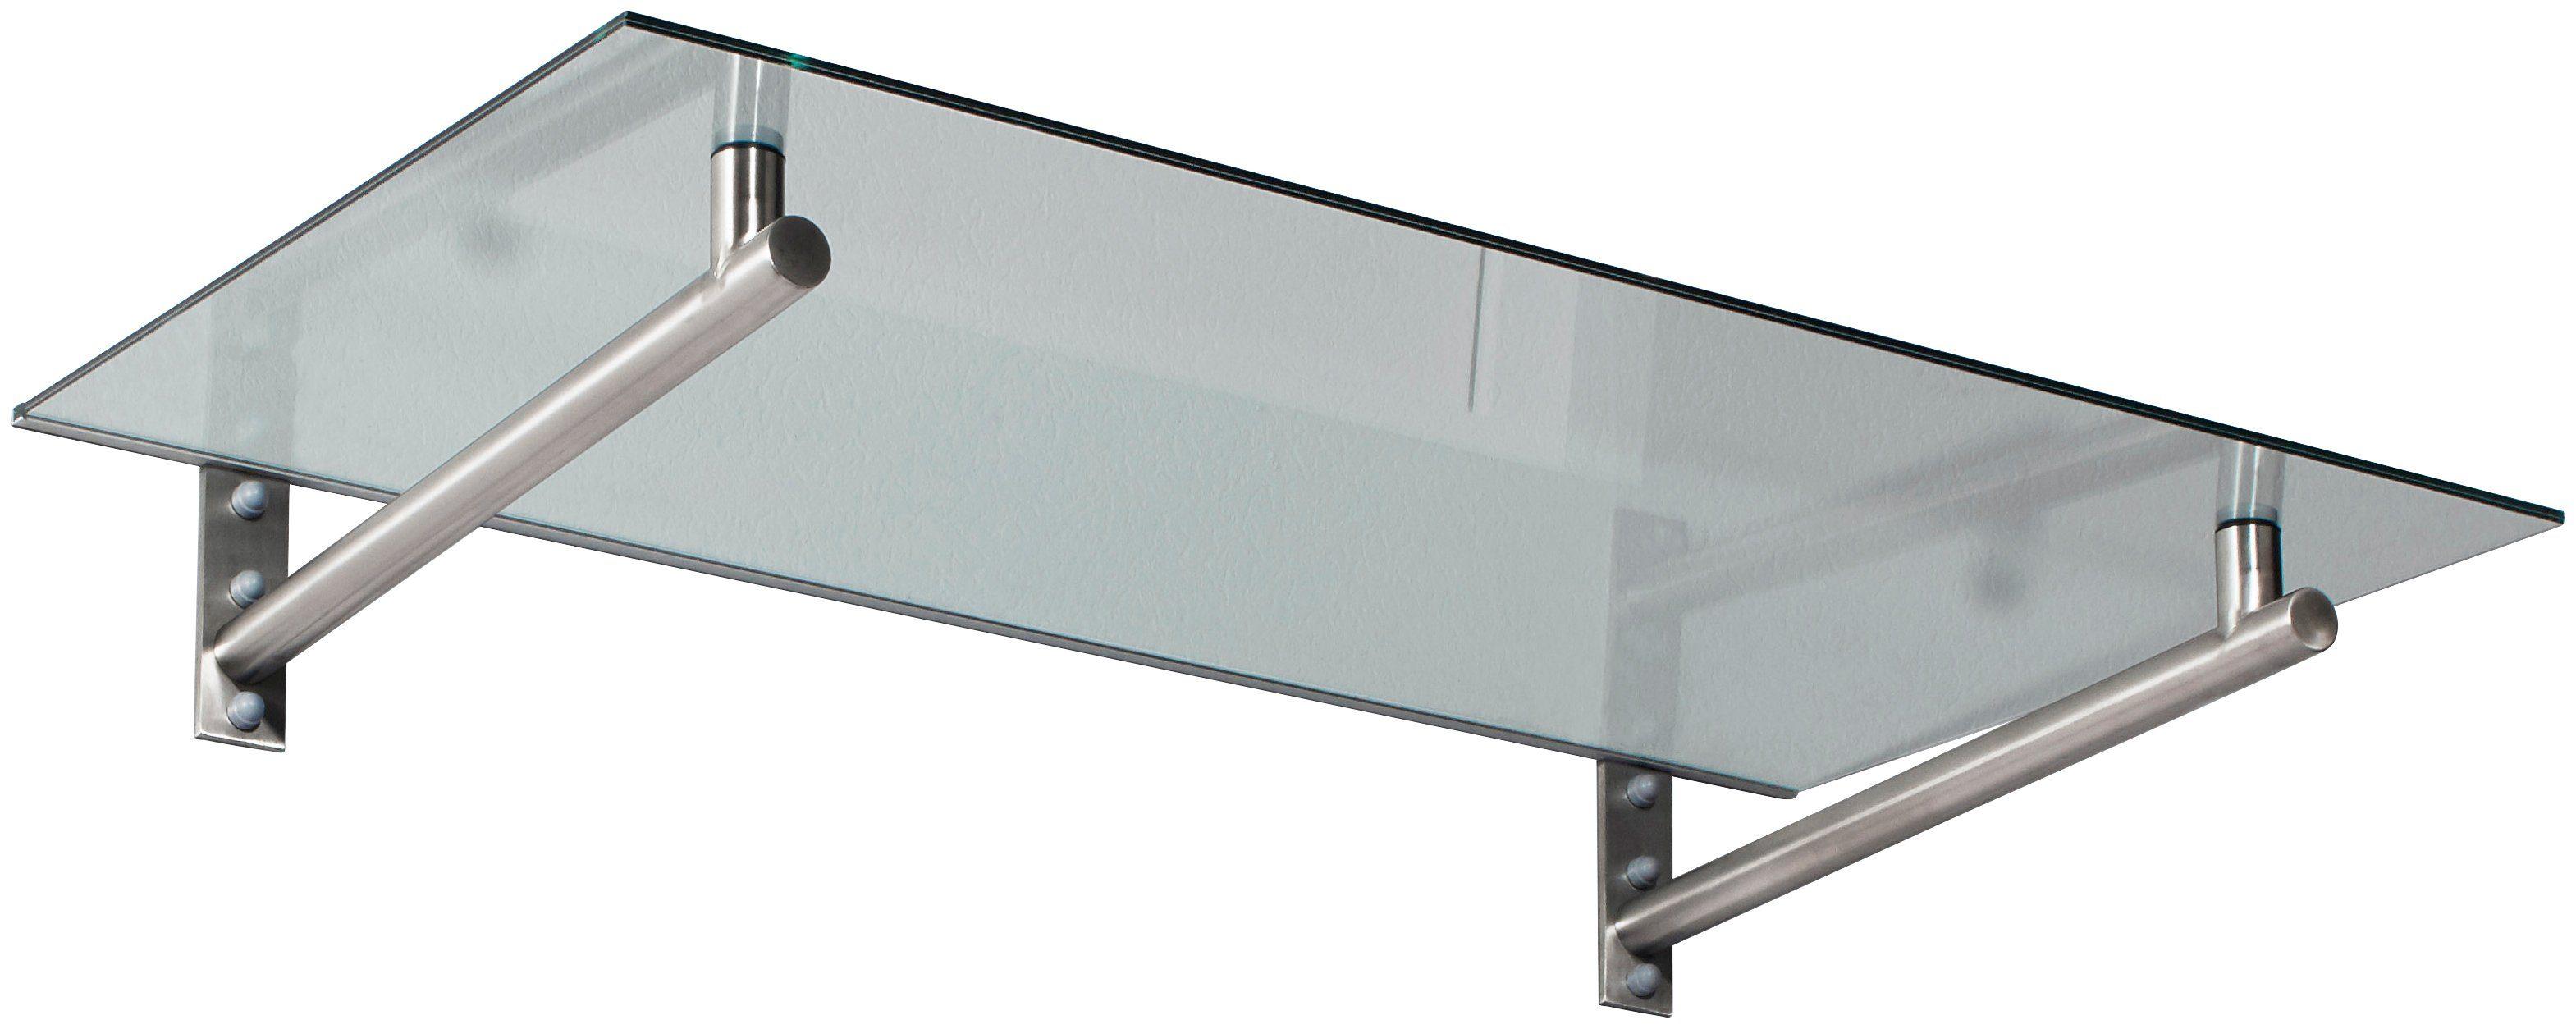 Vordach »HD 140«, 140x80x19,5 cm, silberfarben-transparent